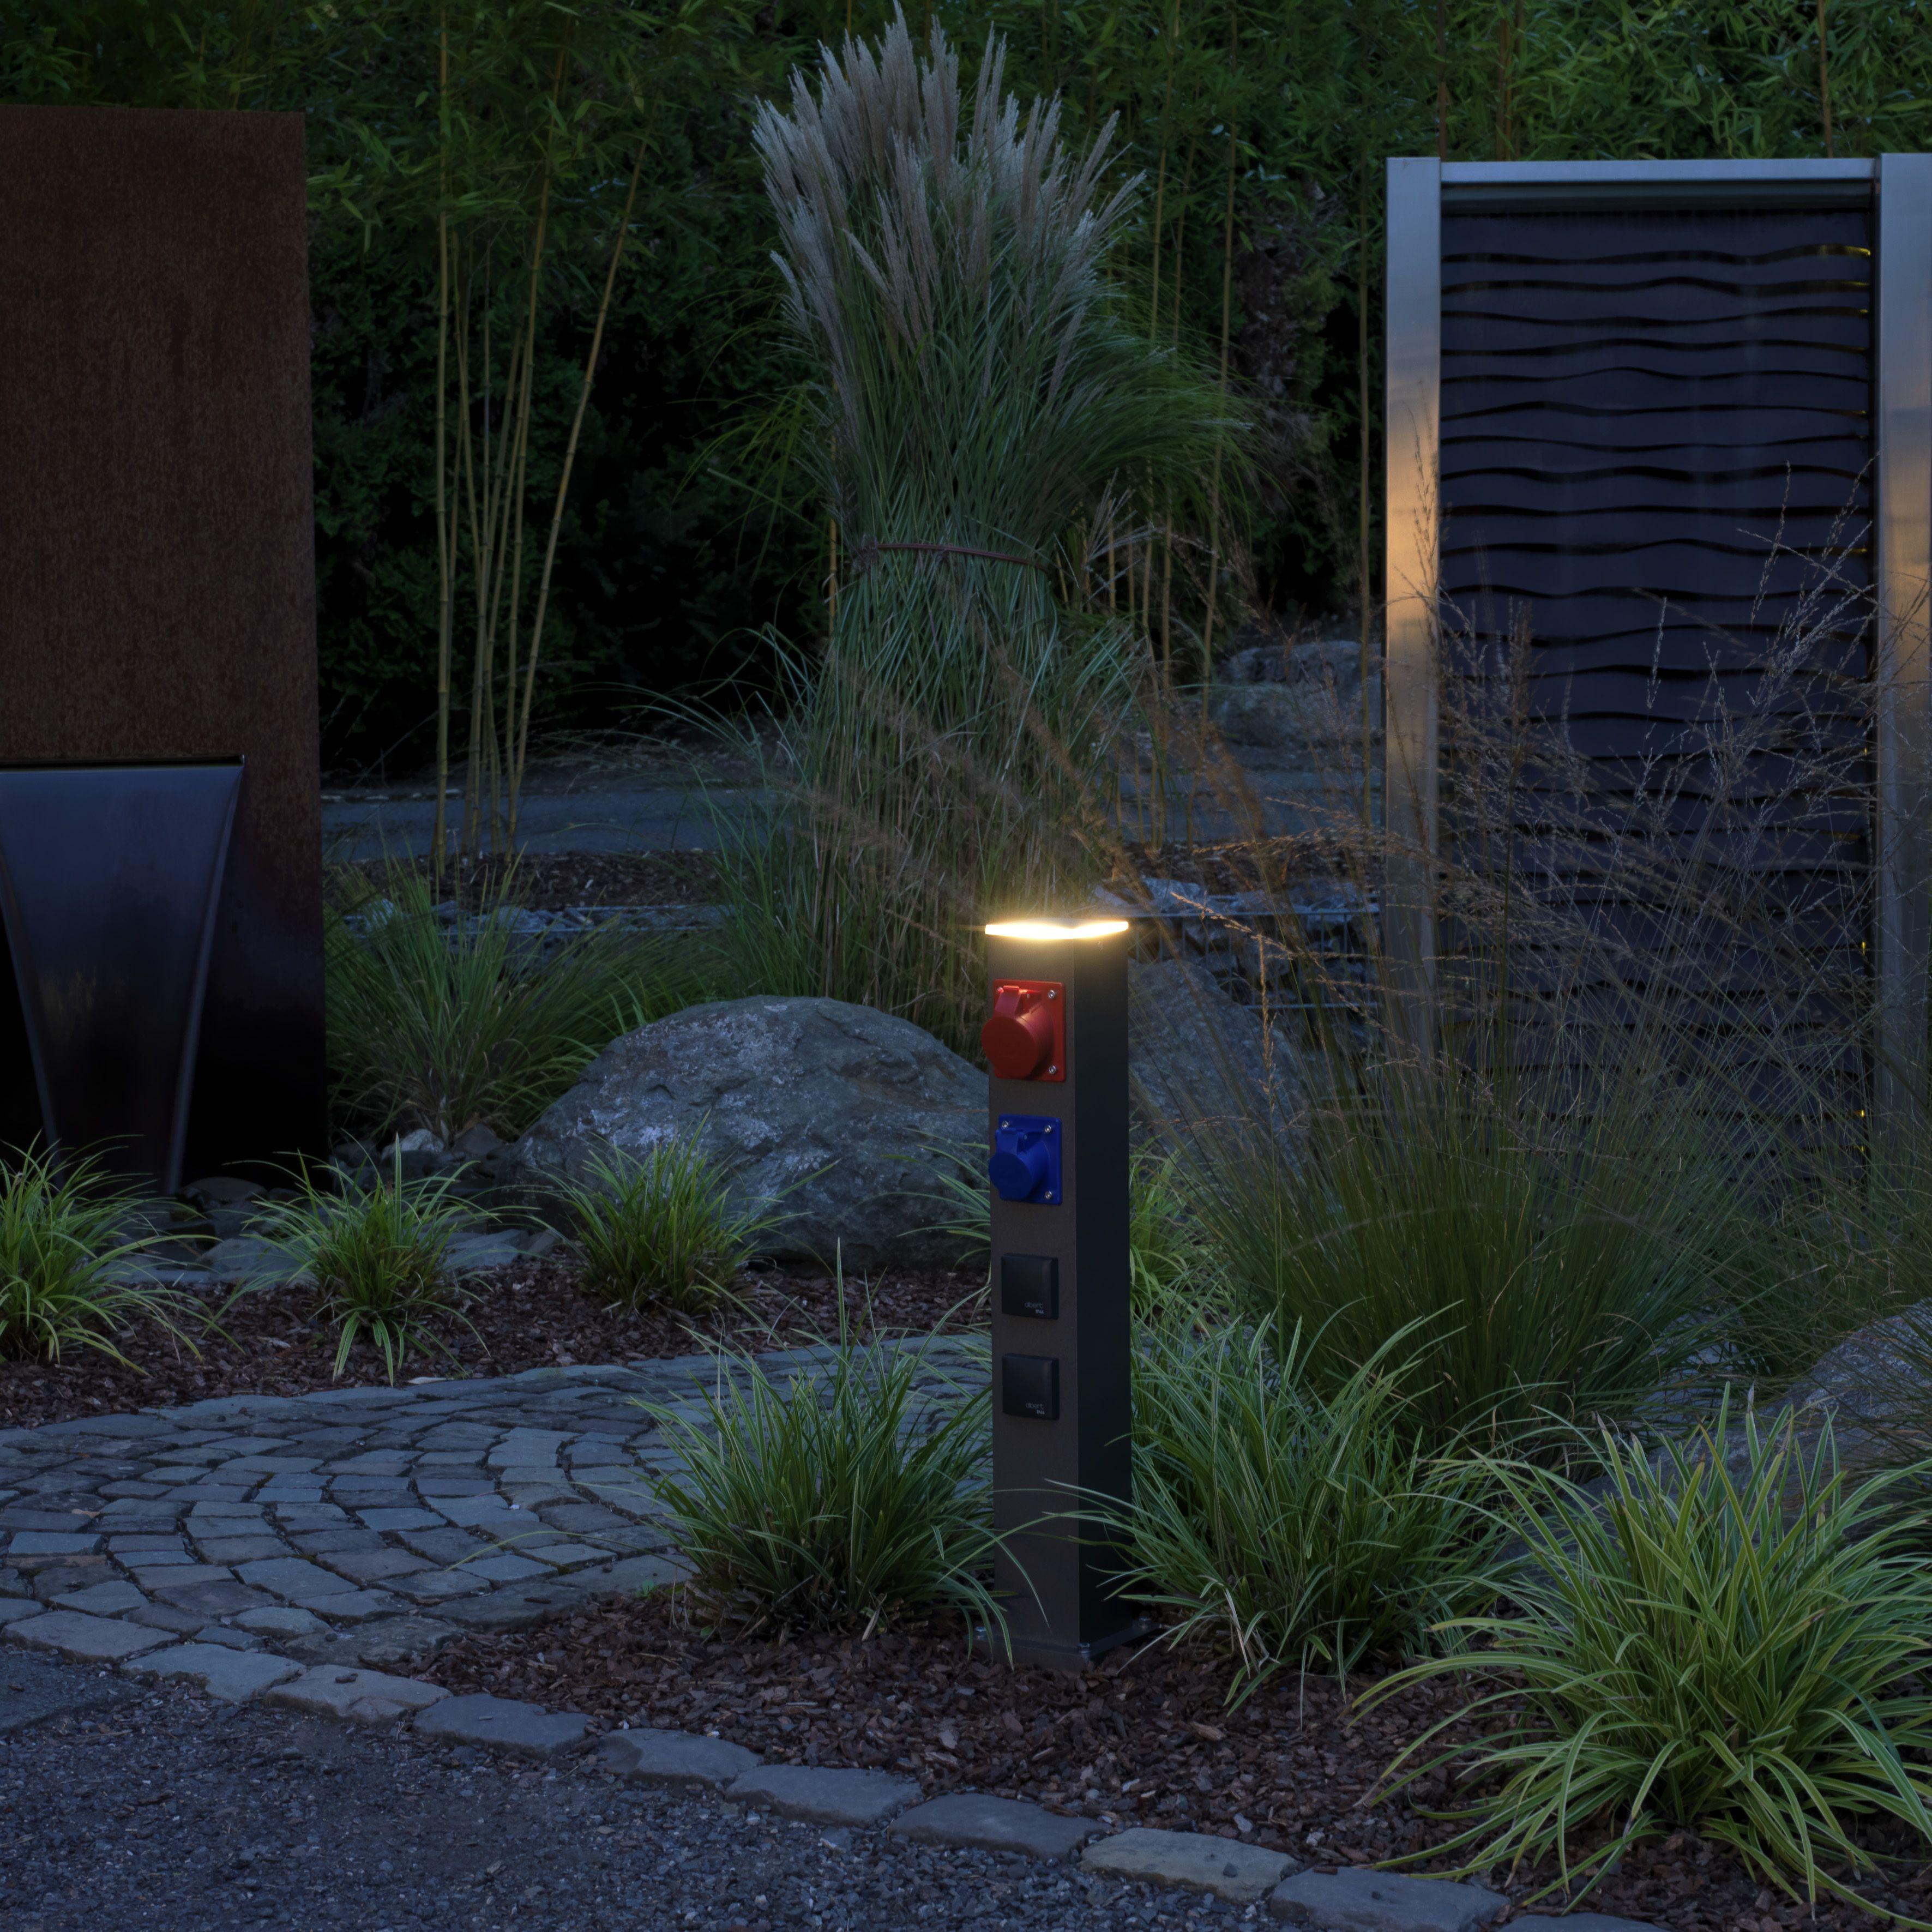 Energie Steckdosensaule Nach Wunsch Albert Leuchten Steckdosen Gartenlampen